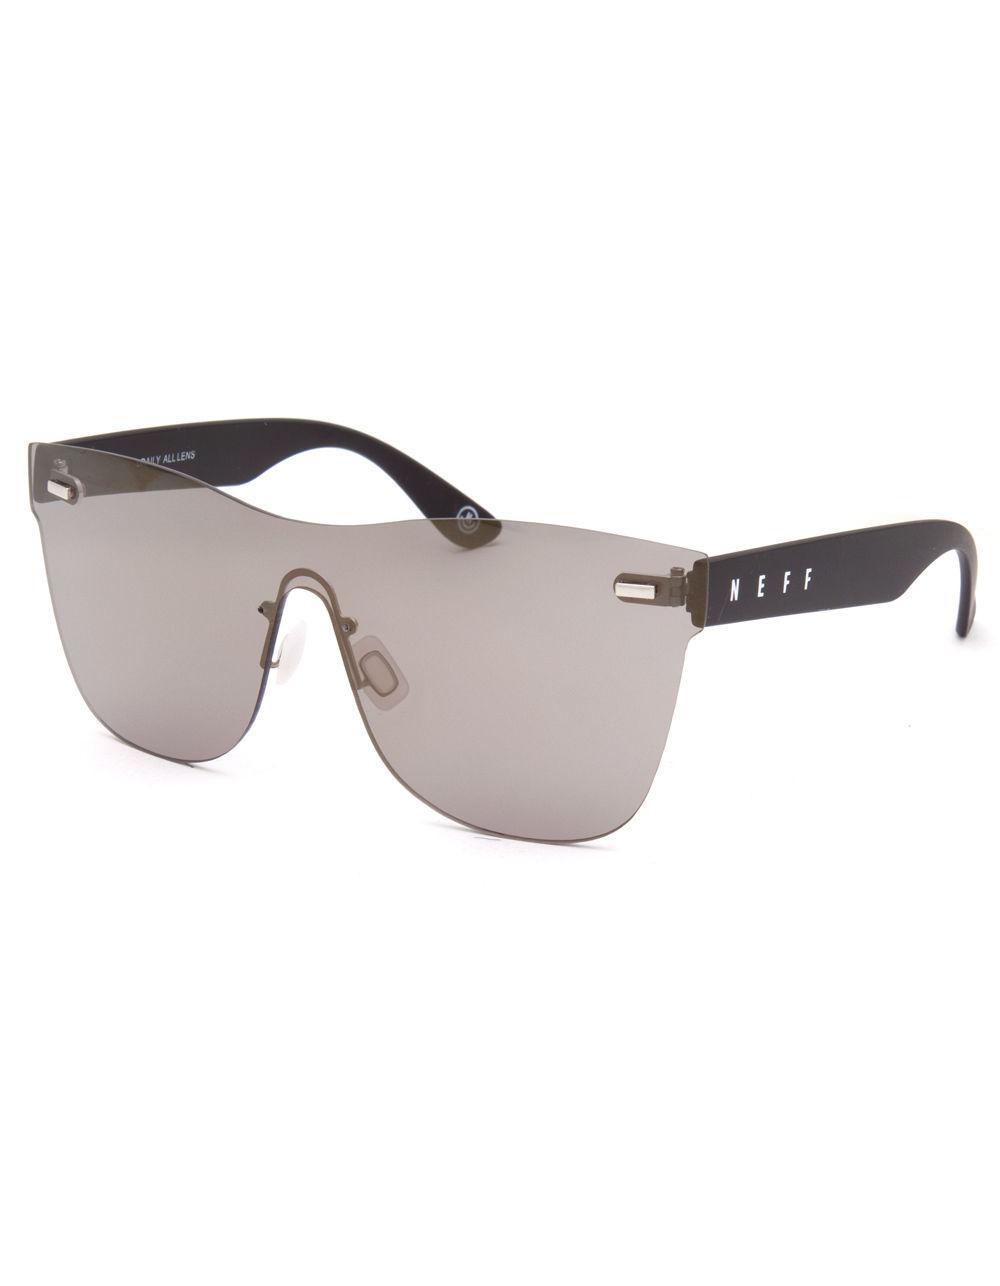 a596cd2c2f Lyst - Neff Daily All Lens Sunglasses